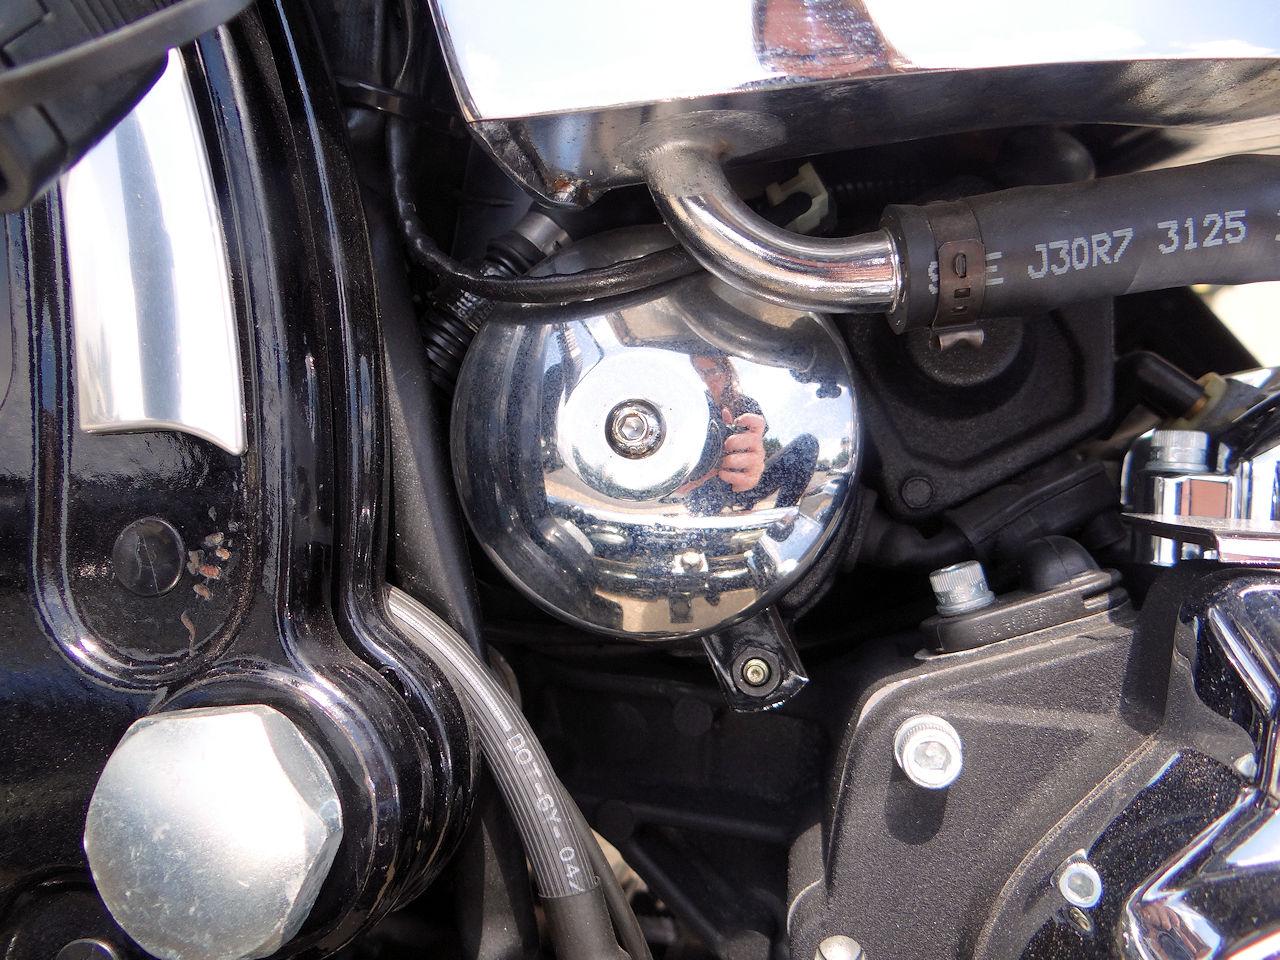 2006 Harley Davidson FLSTNI 90